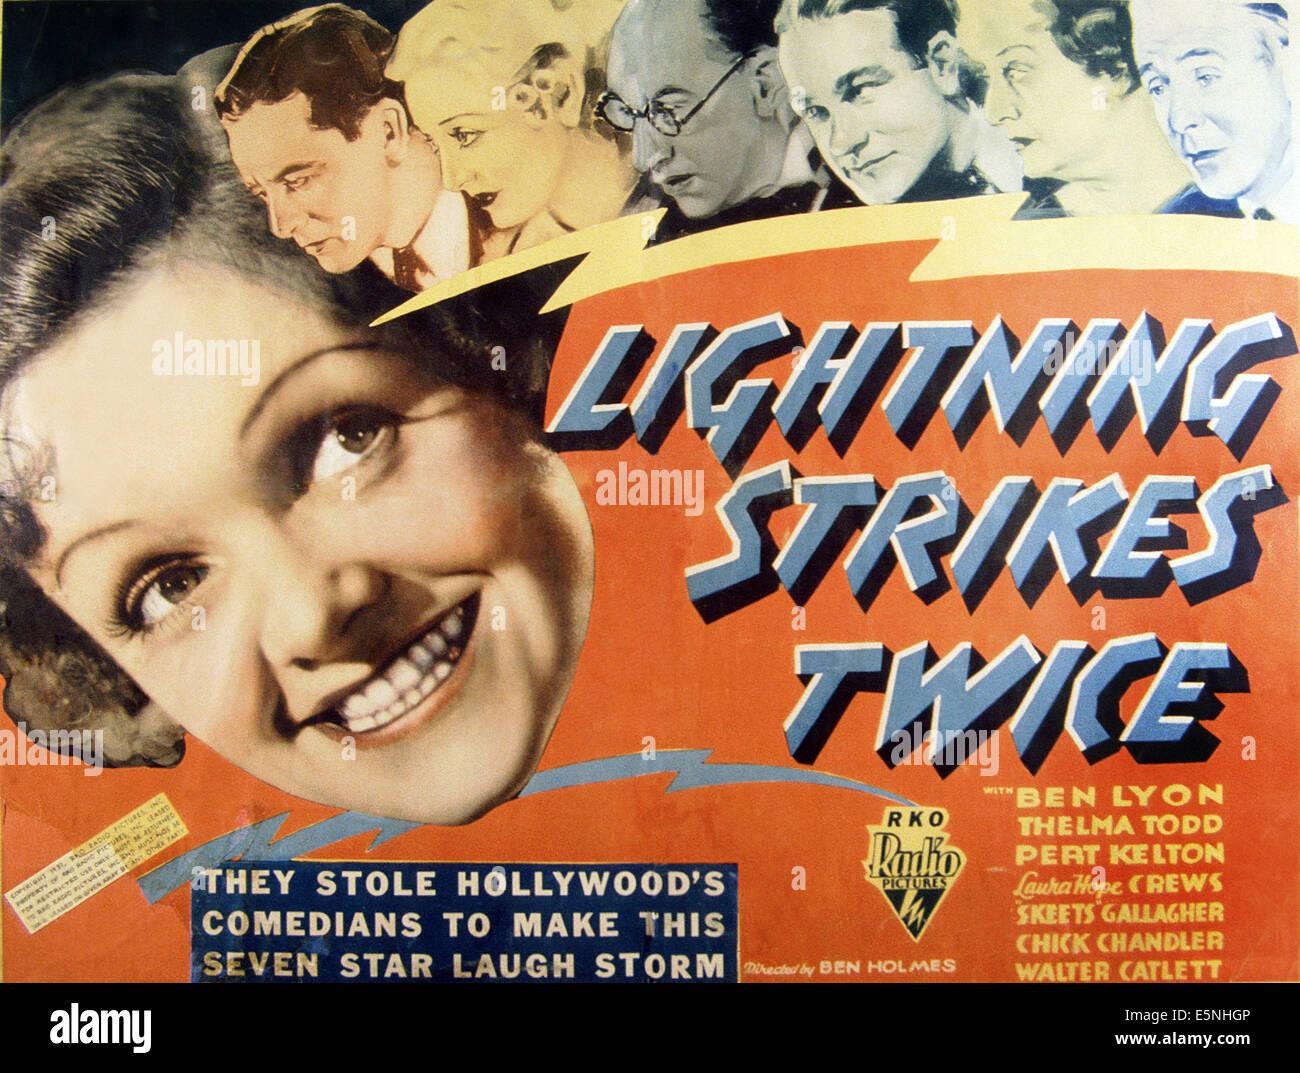 LIGHTNING STRIKES TWICE, from left: Pert Kelton, Ben Lyon, Thelma Todd, Walter Catlett, Chick Chandler, Laura Hope - Stock Image